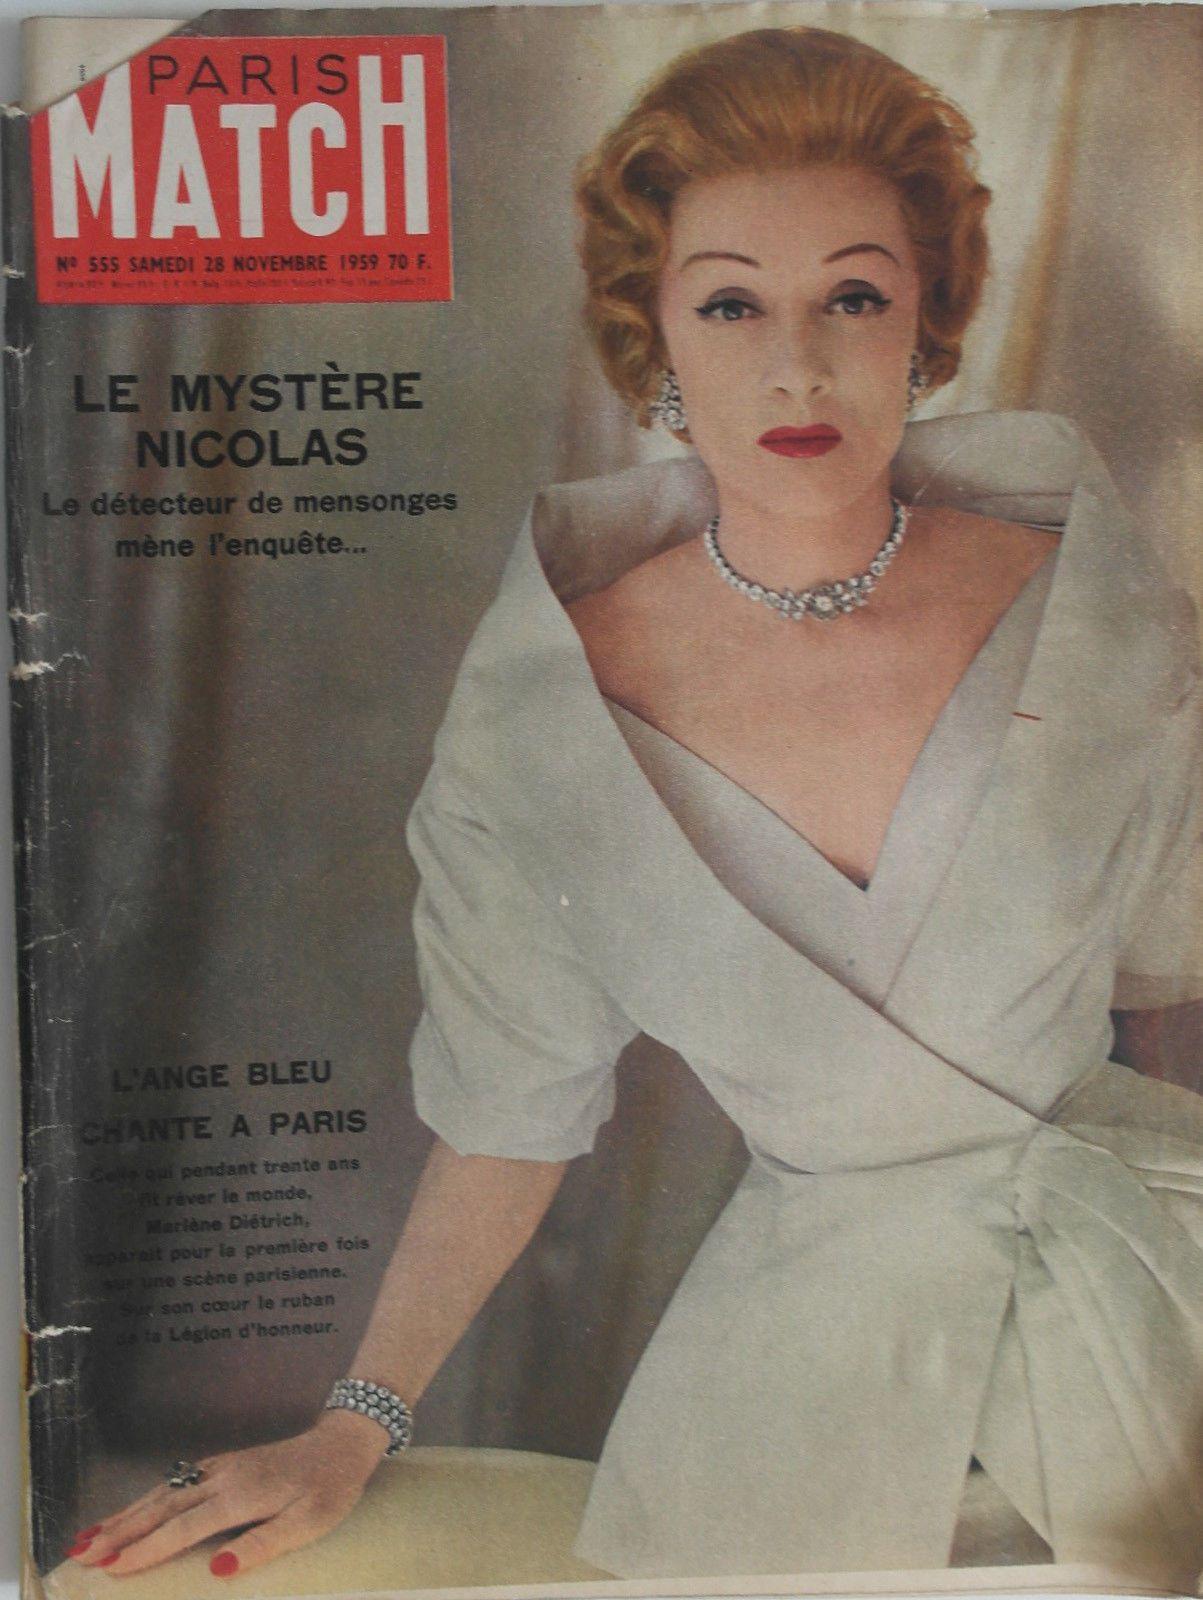 Paris Match N 555 1959 Le Mystere De Nicolas Joan Crawford Marlene Dietrich Joan Crawford Eccentric Clothing